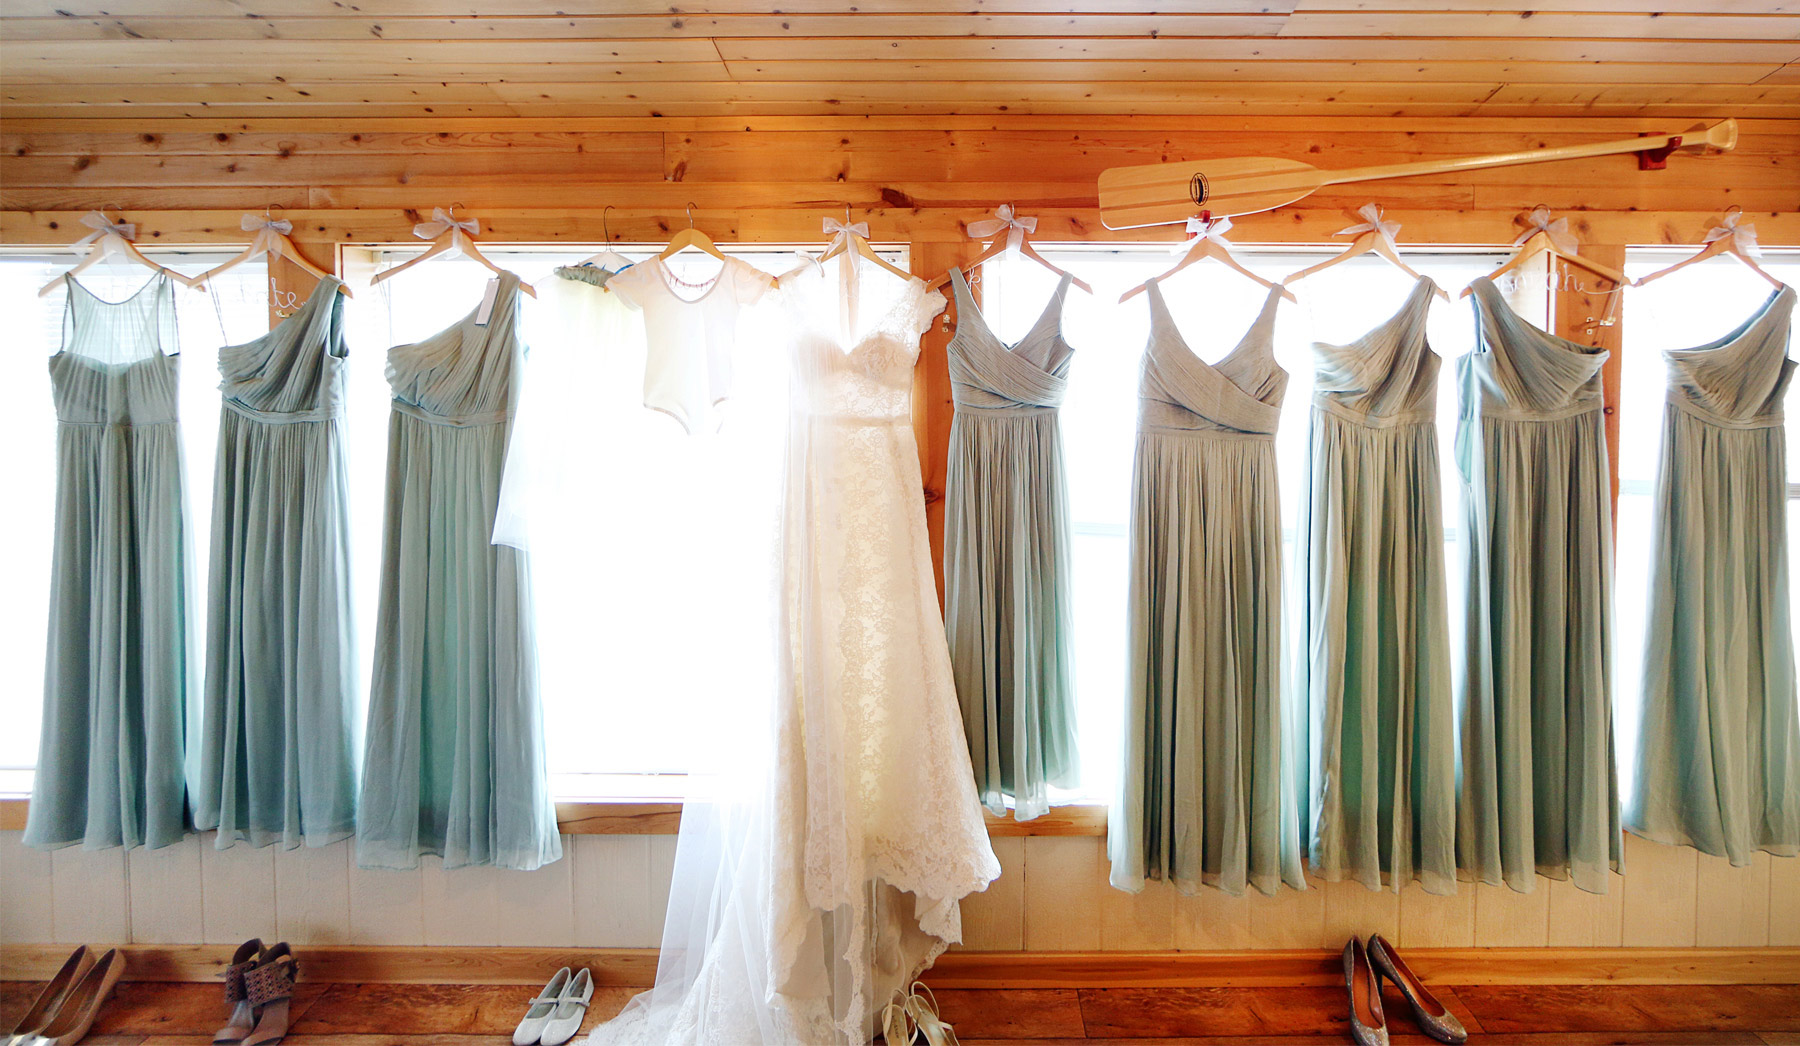 01-Stillwater-Minnesota-Wedding-Photography-by-Vick-Photography-Cabin-Wedding-Dresses-Bridesmaids-Alicia-&-Cole.jpg